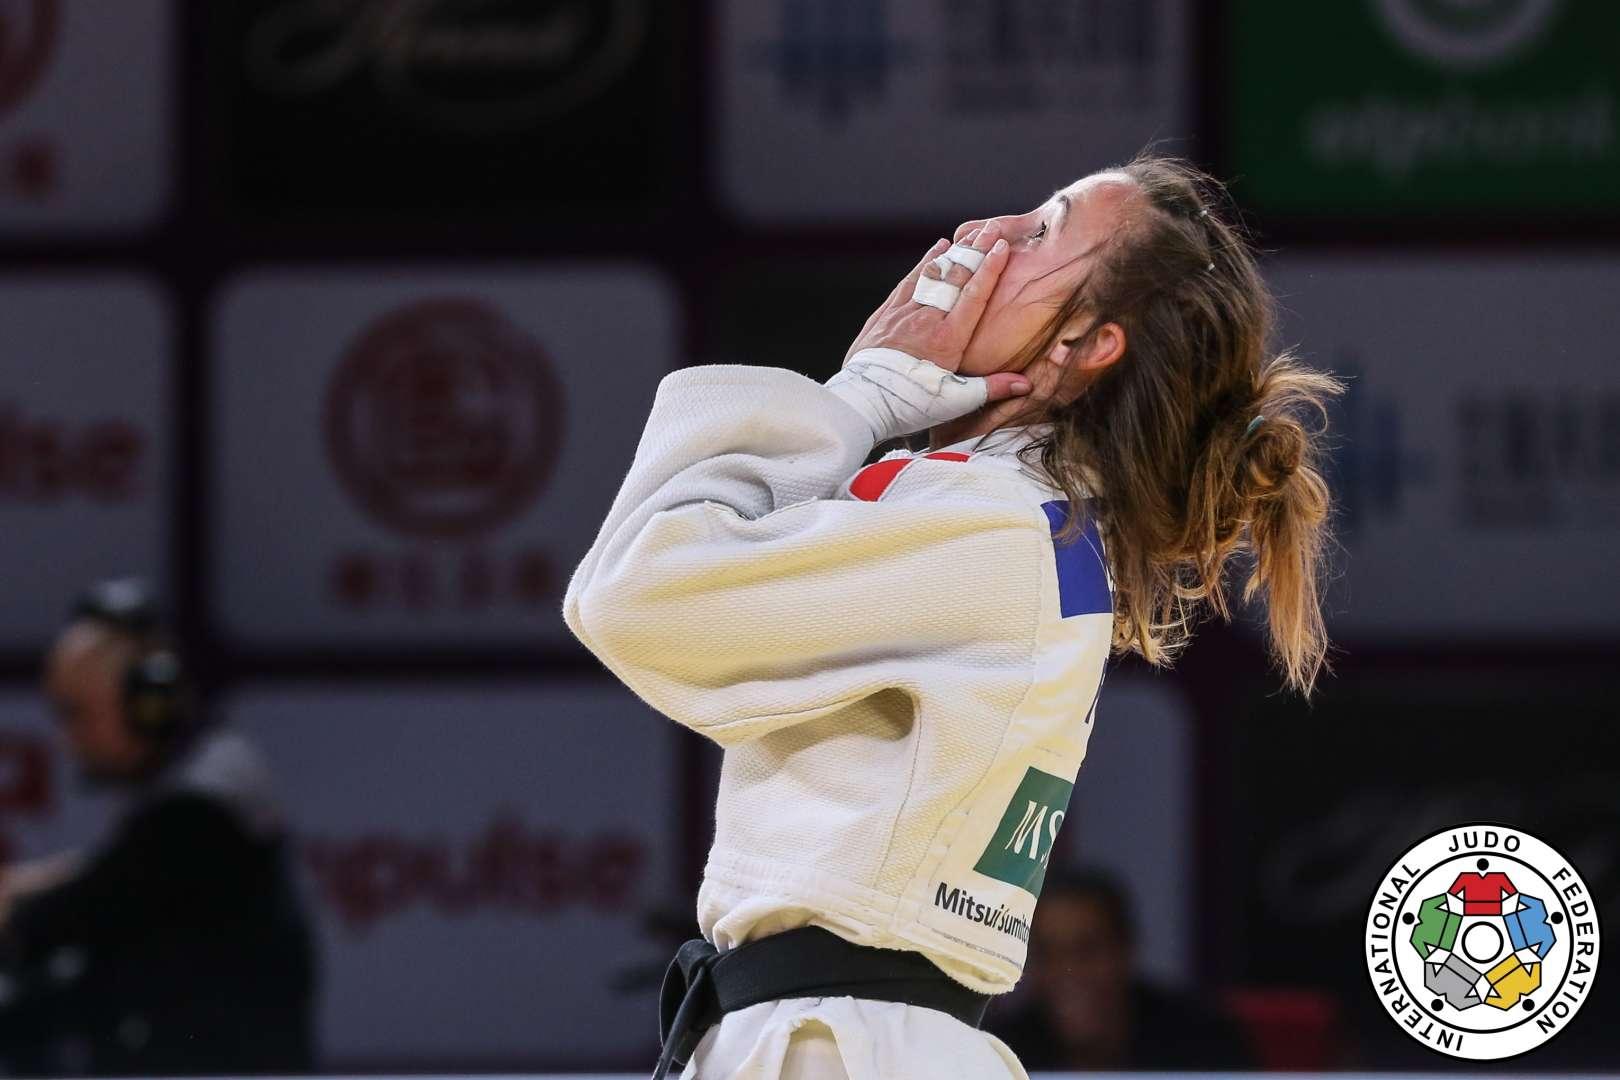 World Judo Masters 2019 - Qingdao